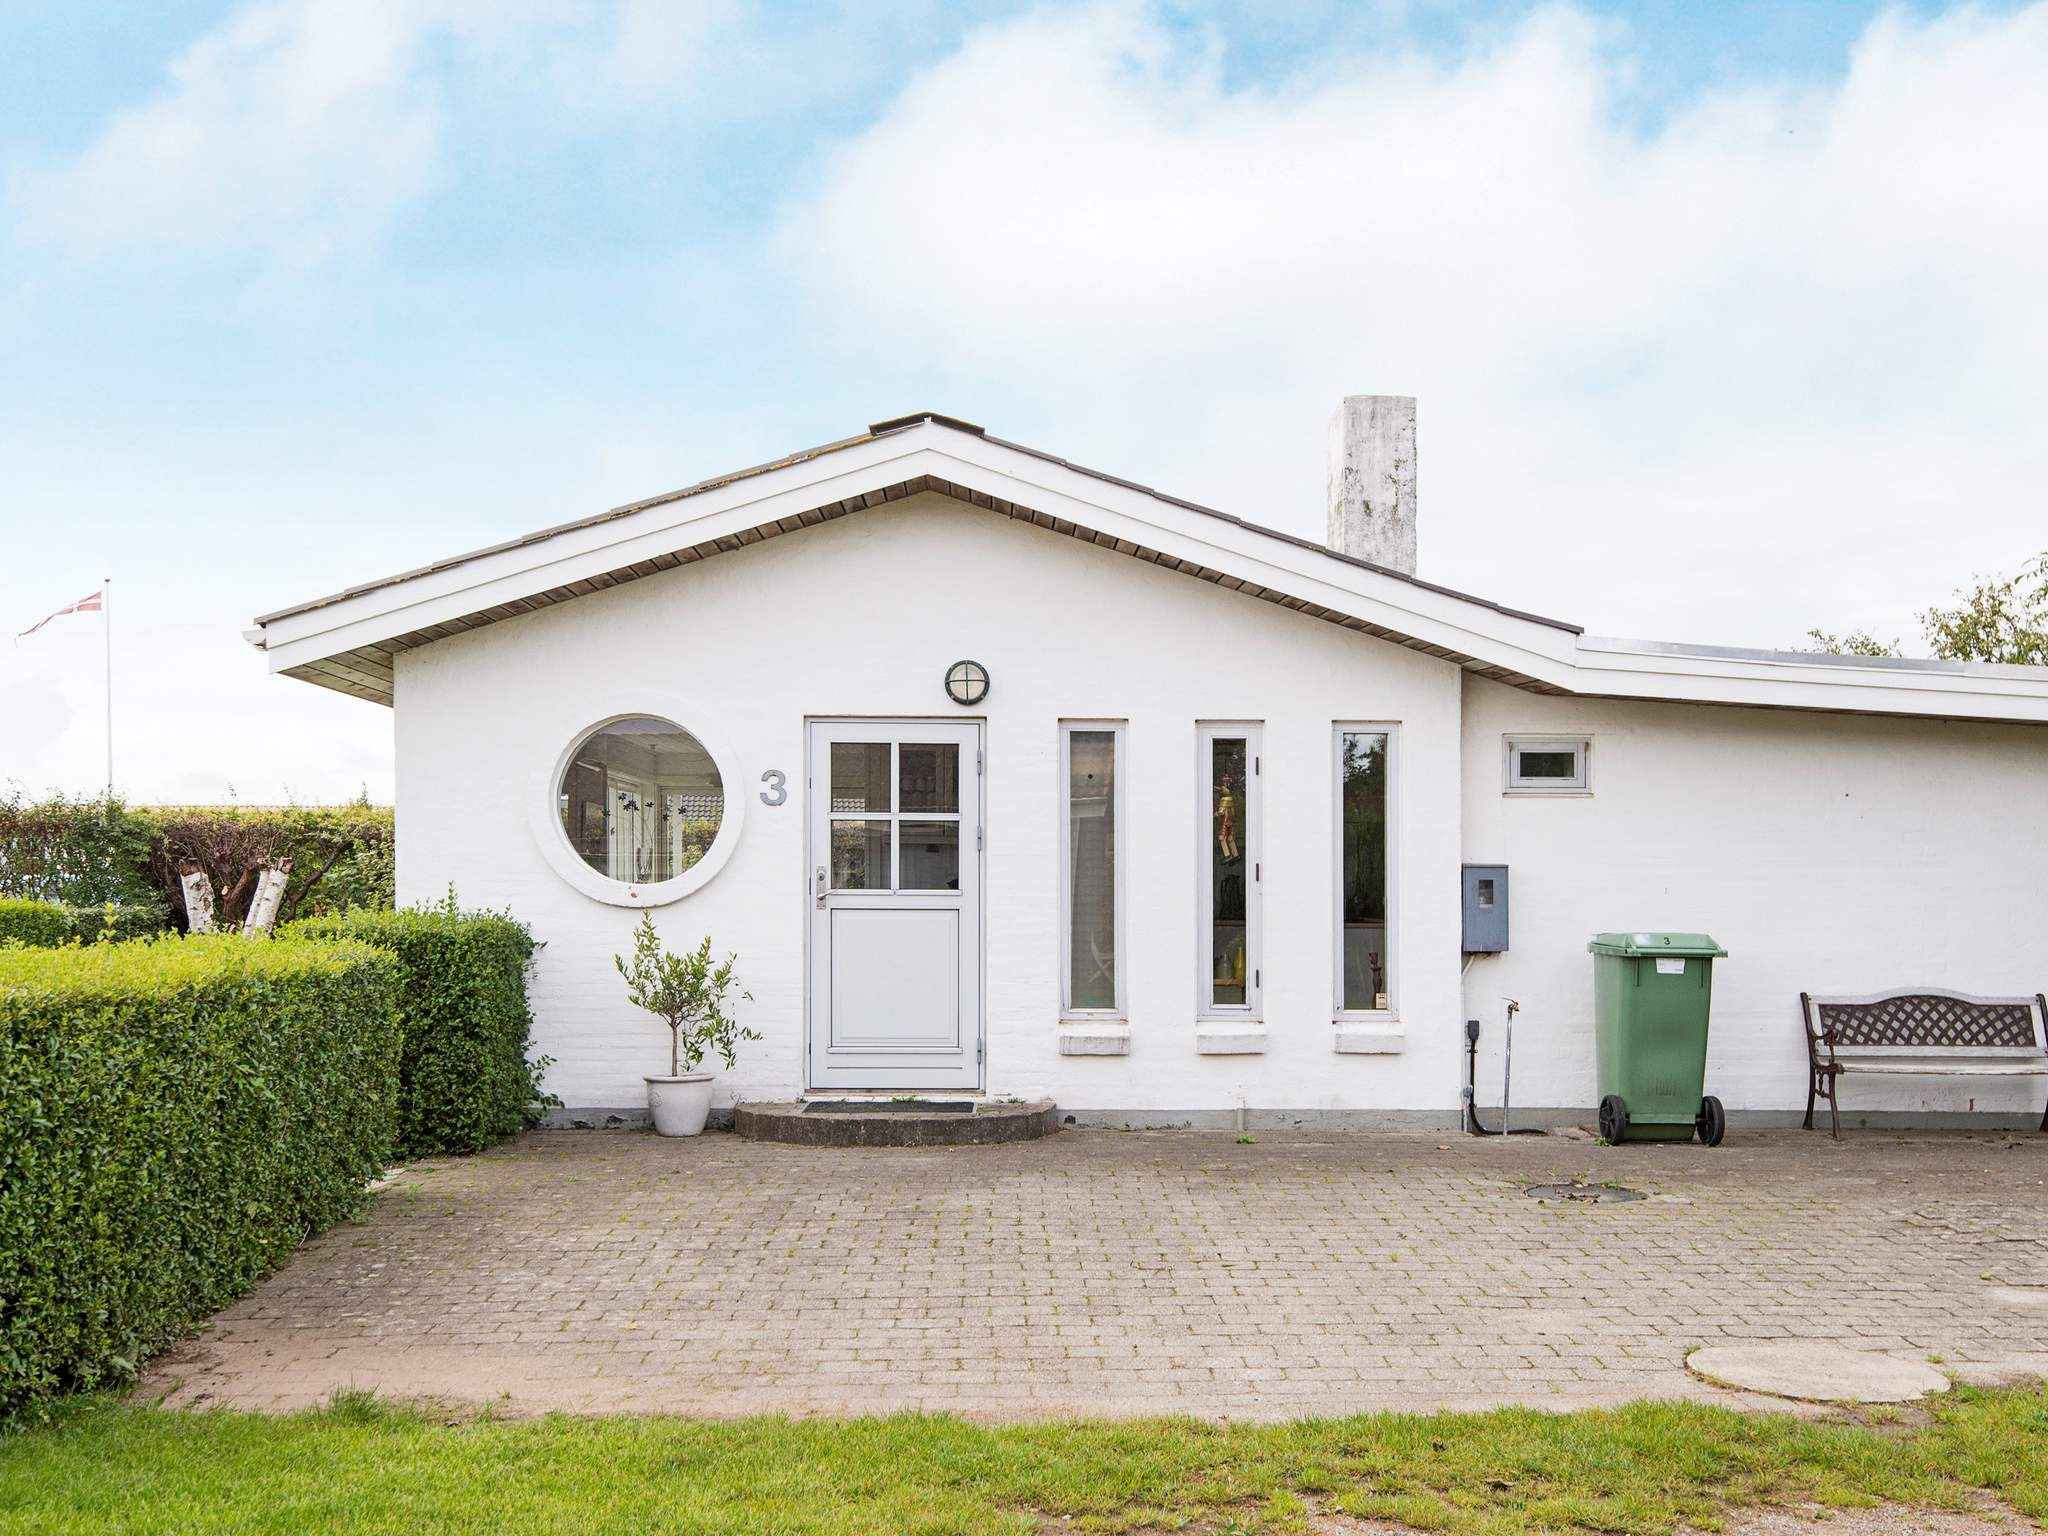 Ferienhaus Ajstrup Strand/Malling (2355032), Ajstrup, , Dänische Ostsee, Dänemark, Bild 12